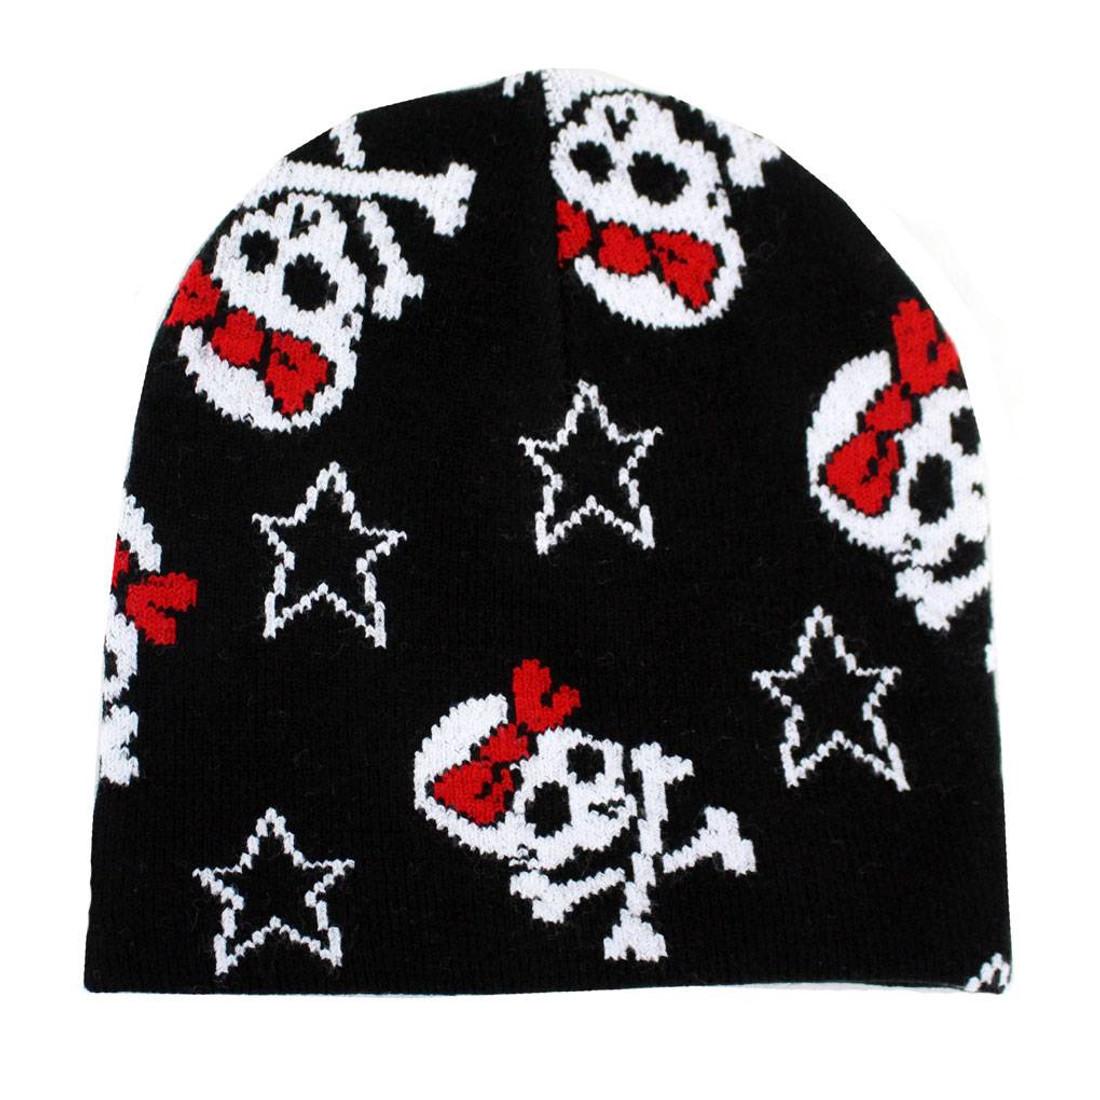 15be835e3c7 Black Beanie Skull   Crossbones with Red Bow Stars Knit Hat Snowboard  Headgear